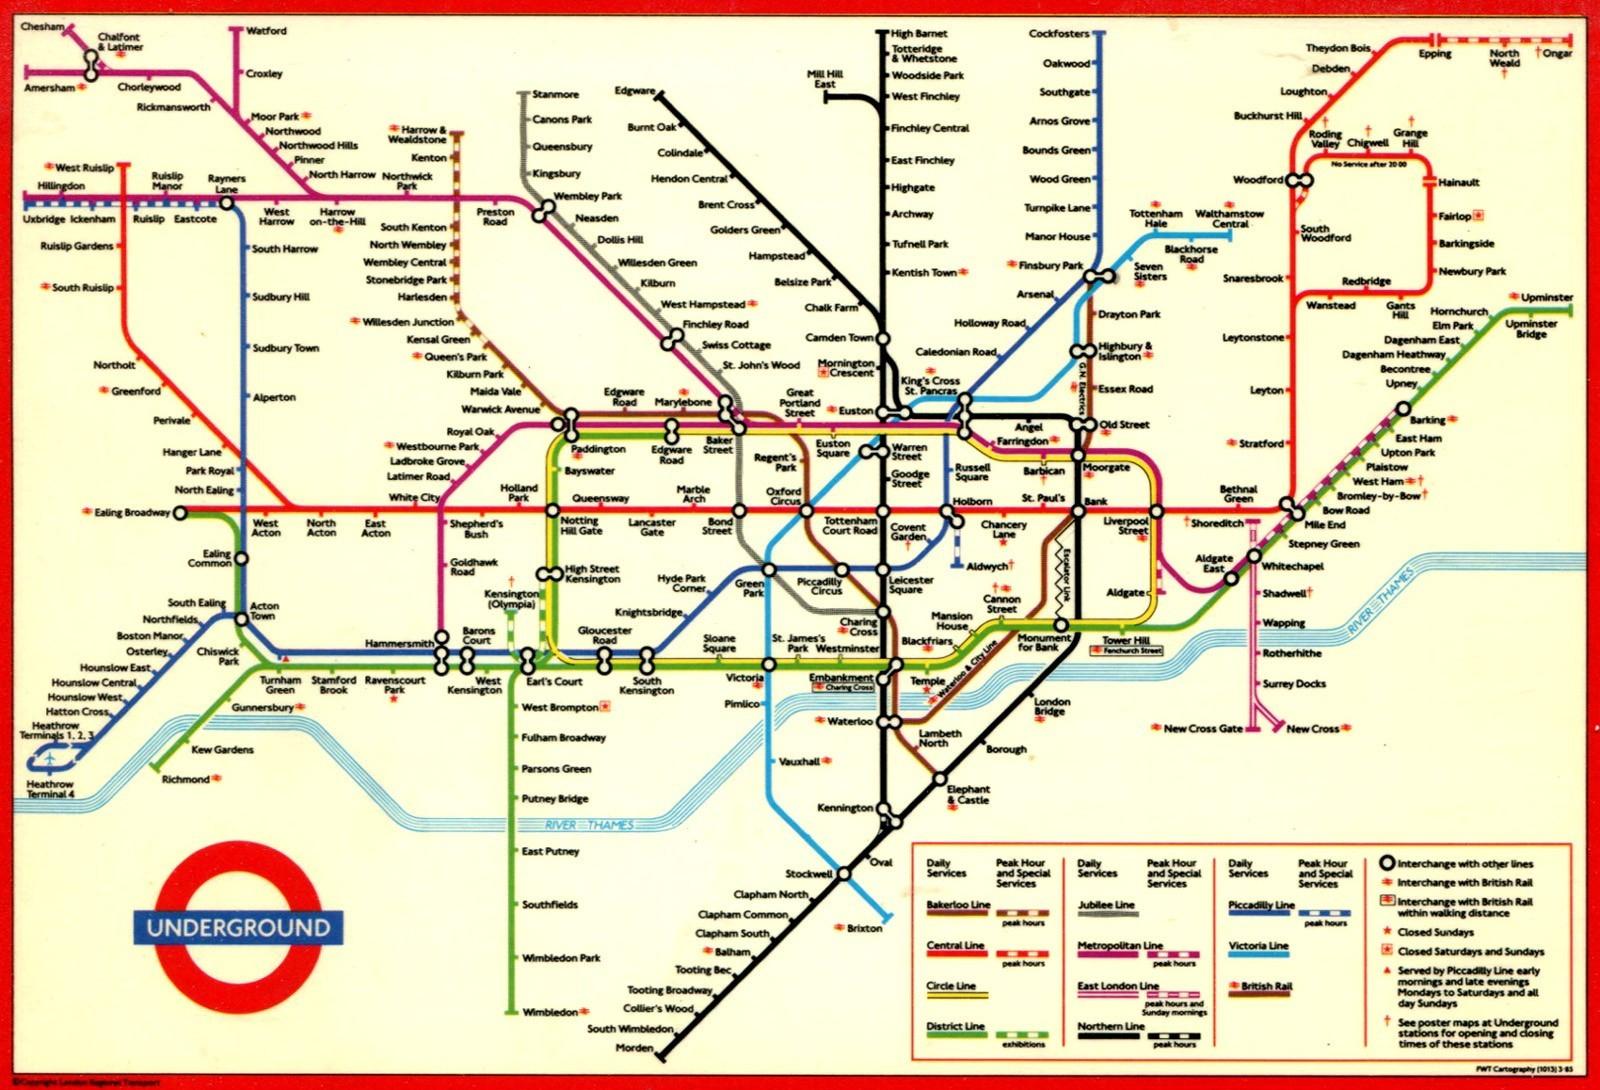 Large Print Tube Map Pleasing London Underground Printable With And - Printable London Underground Map